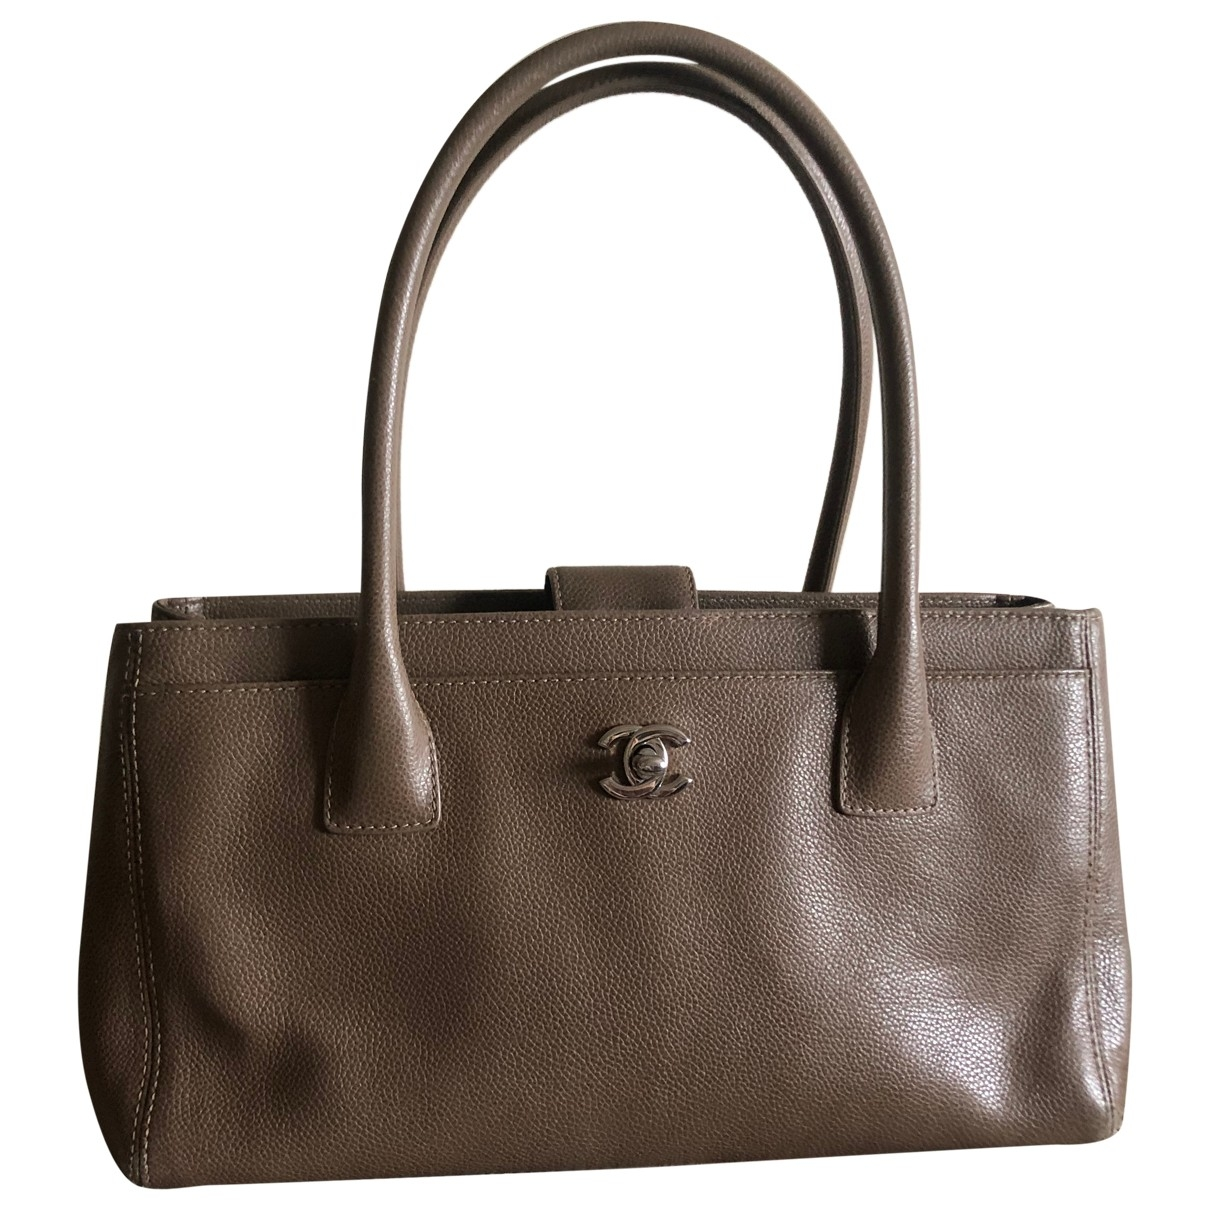 Chanel Executive Beige Leather handbag for Women \N